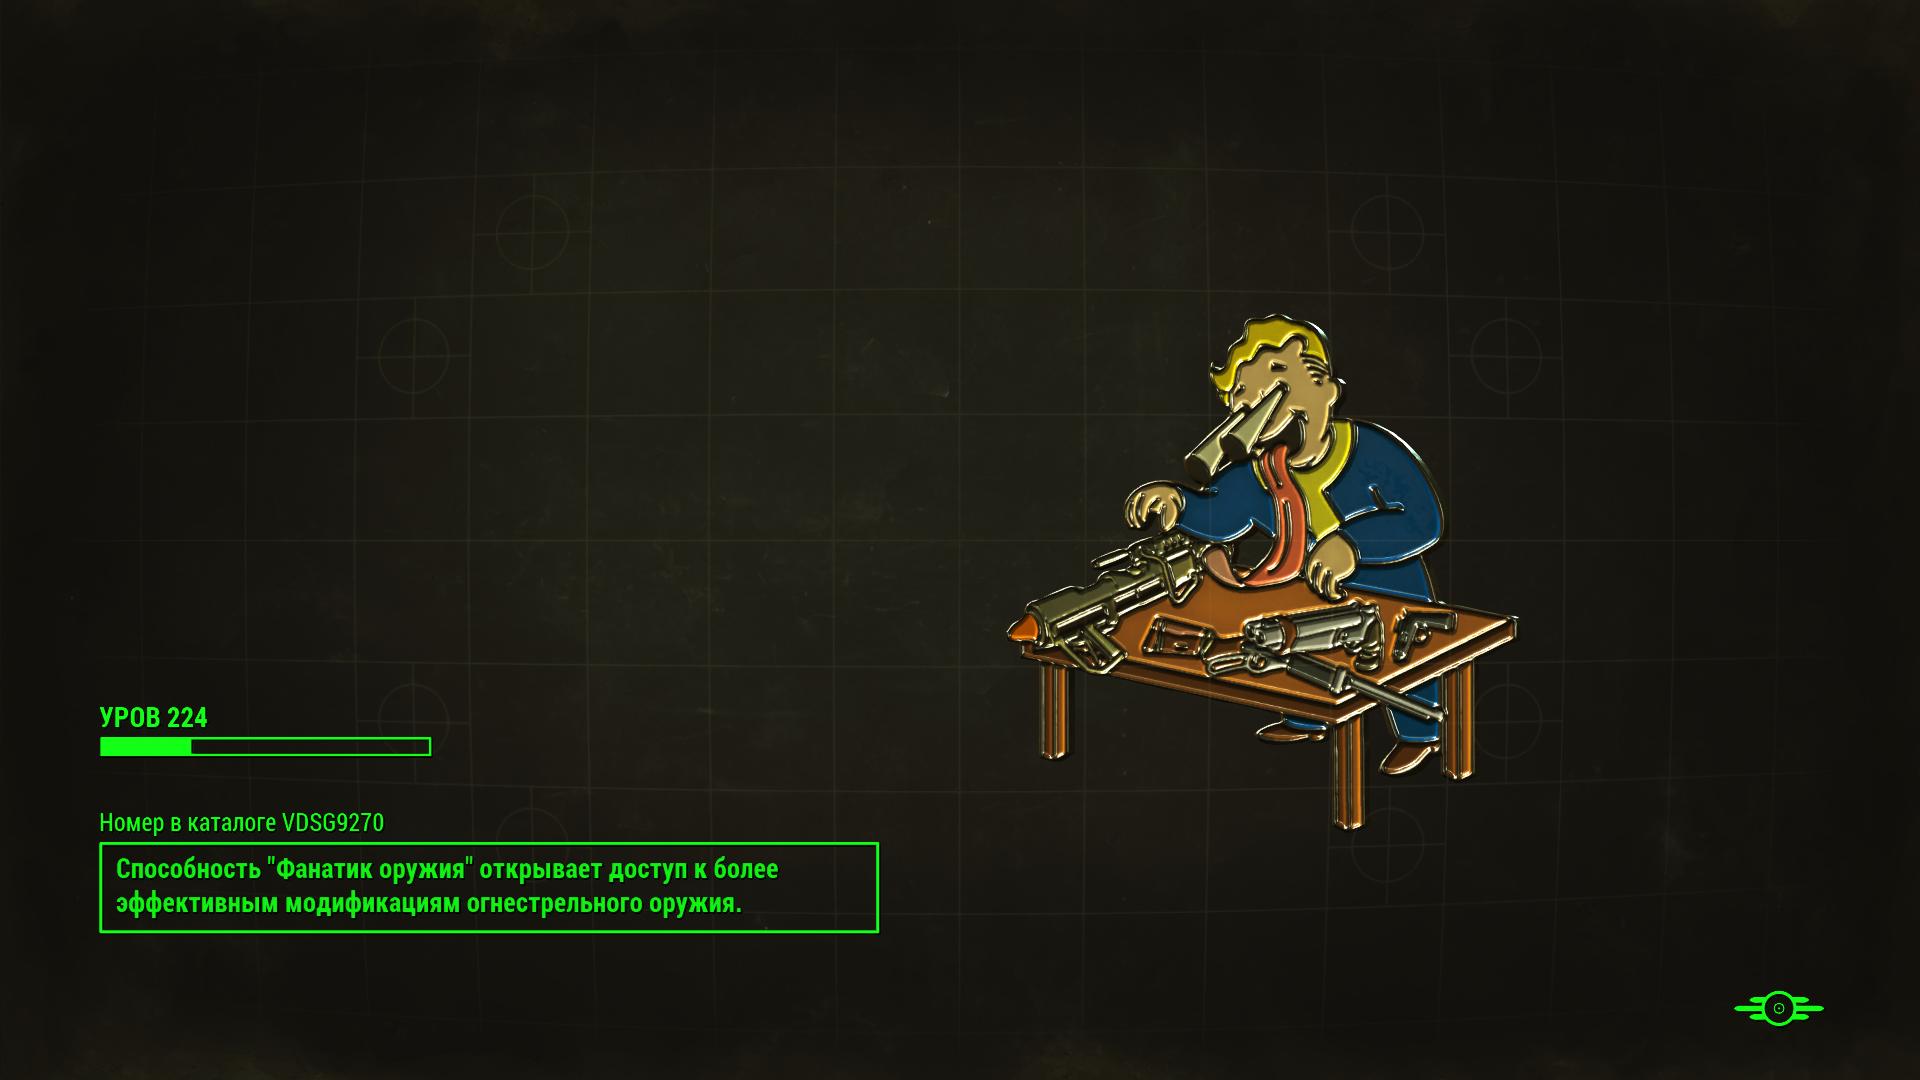 Фанатик оружия (Fallout 4)